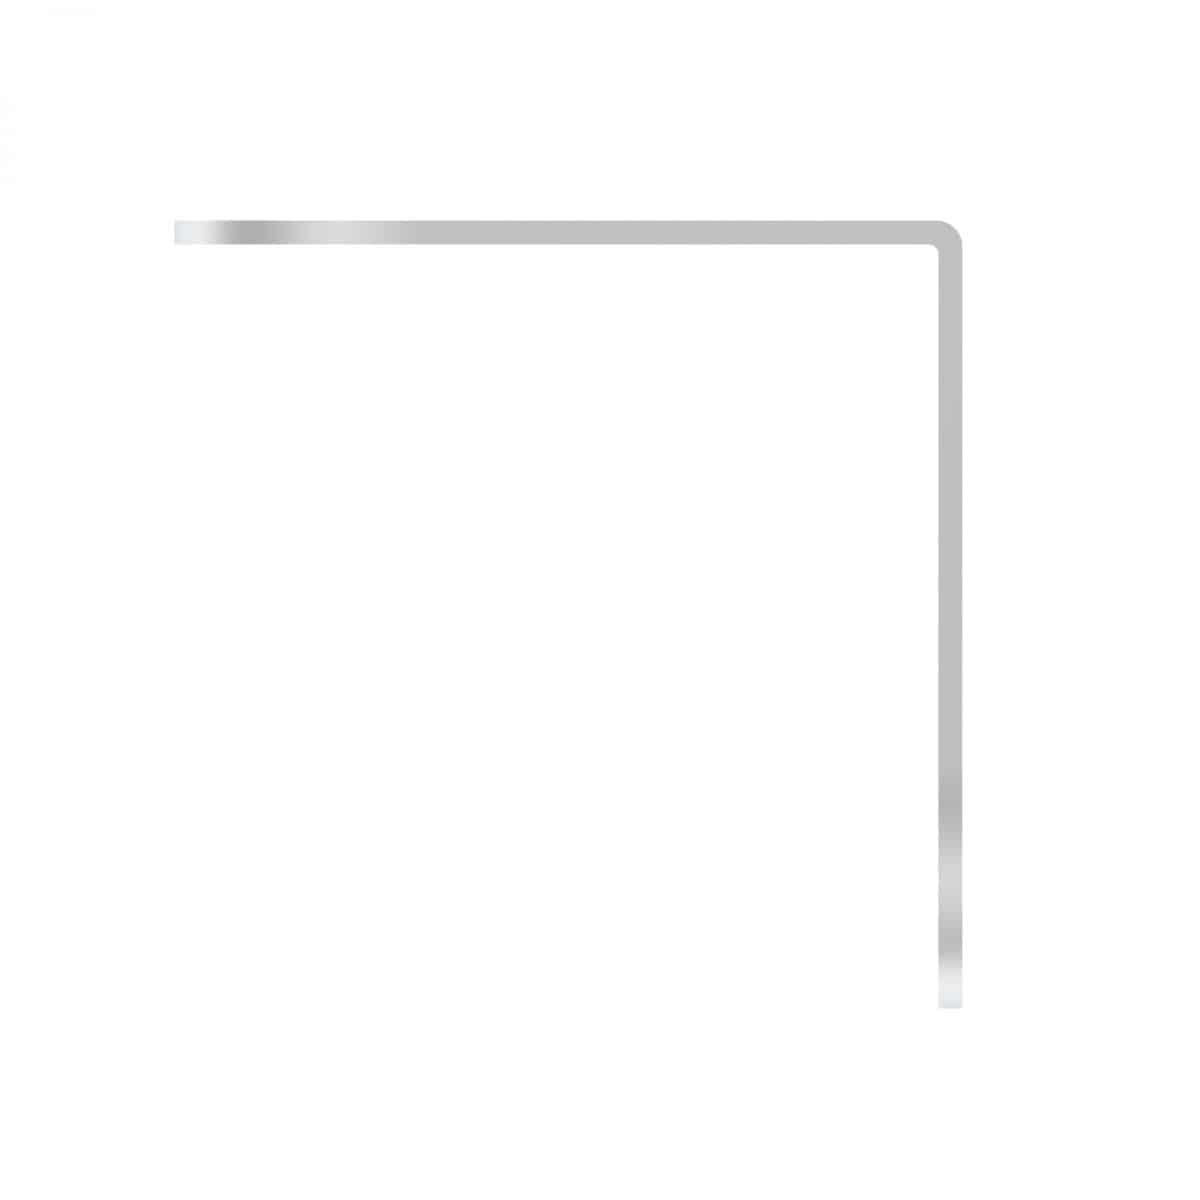 RMOR Hardware B4602 4 Hole Corner Angle Steel Brace